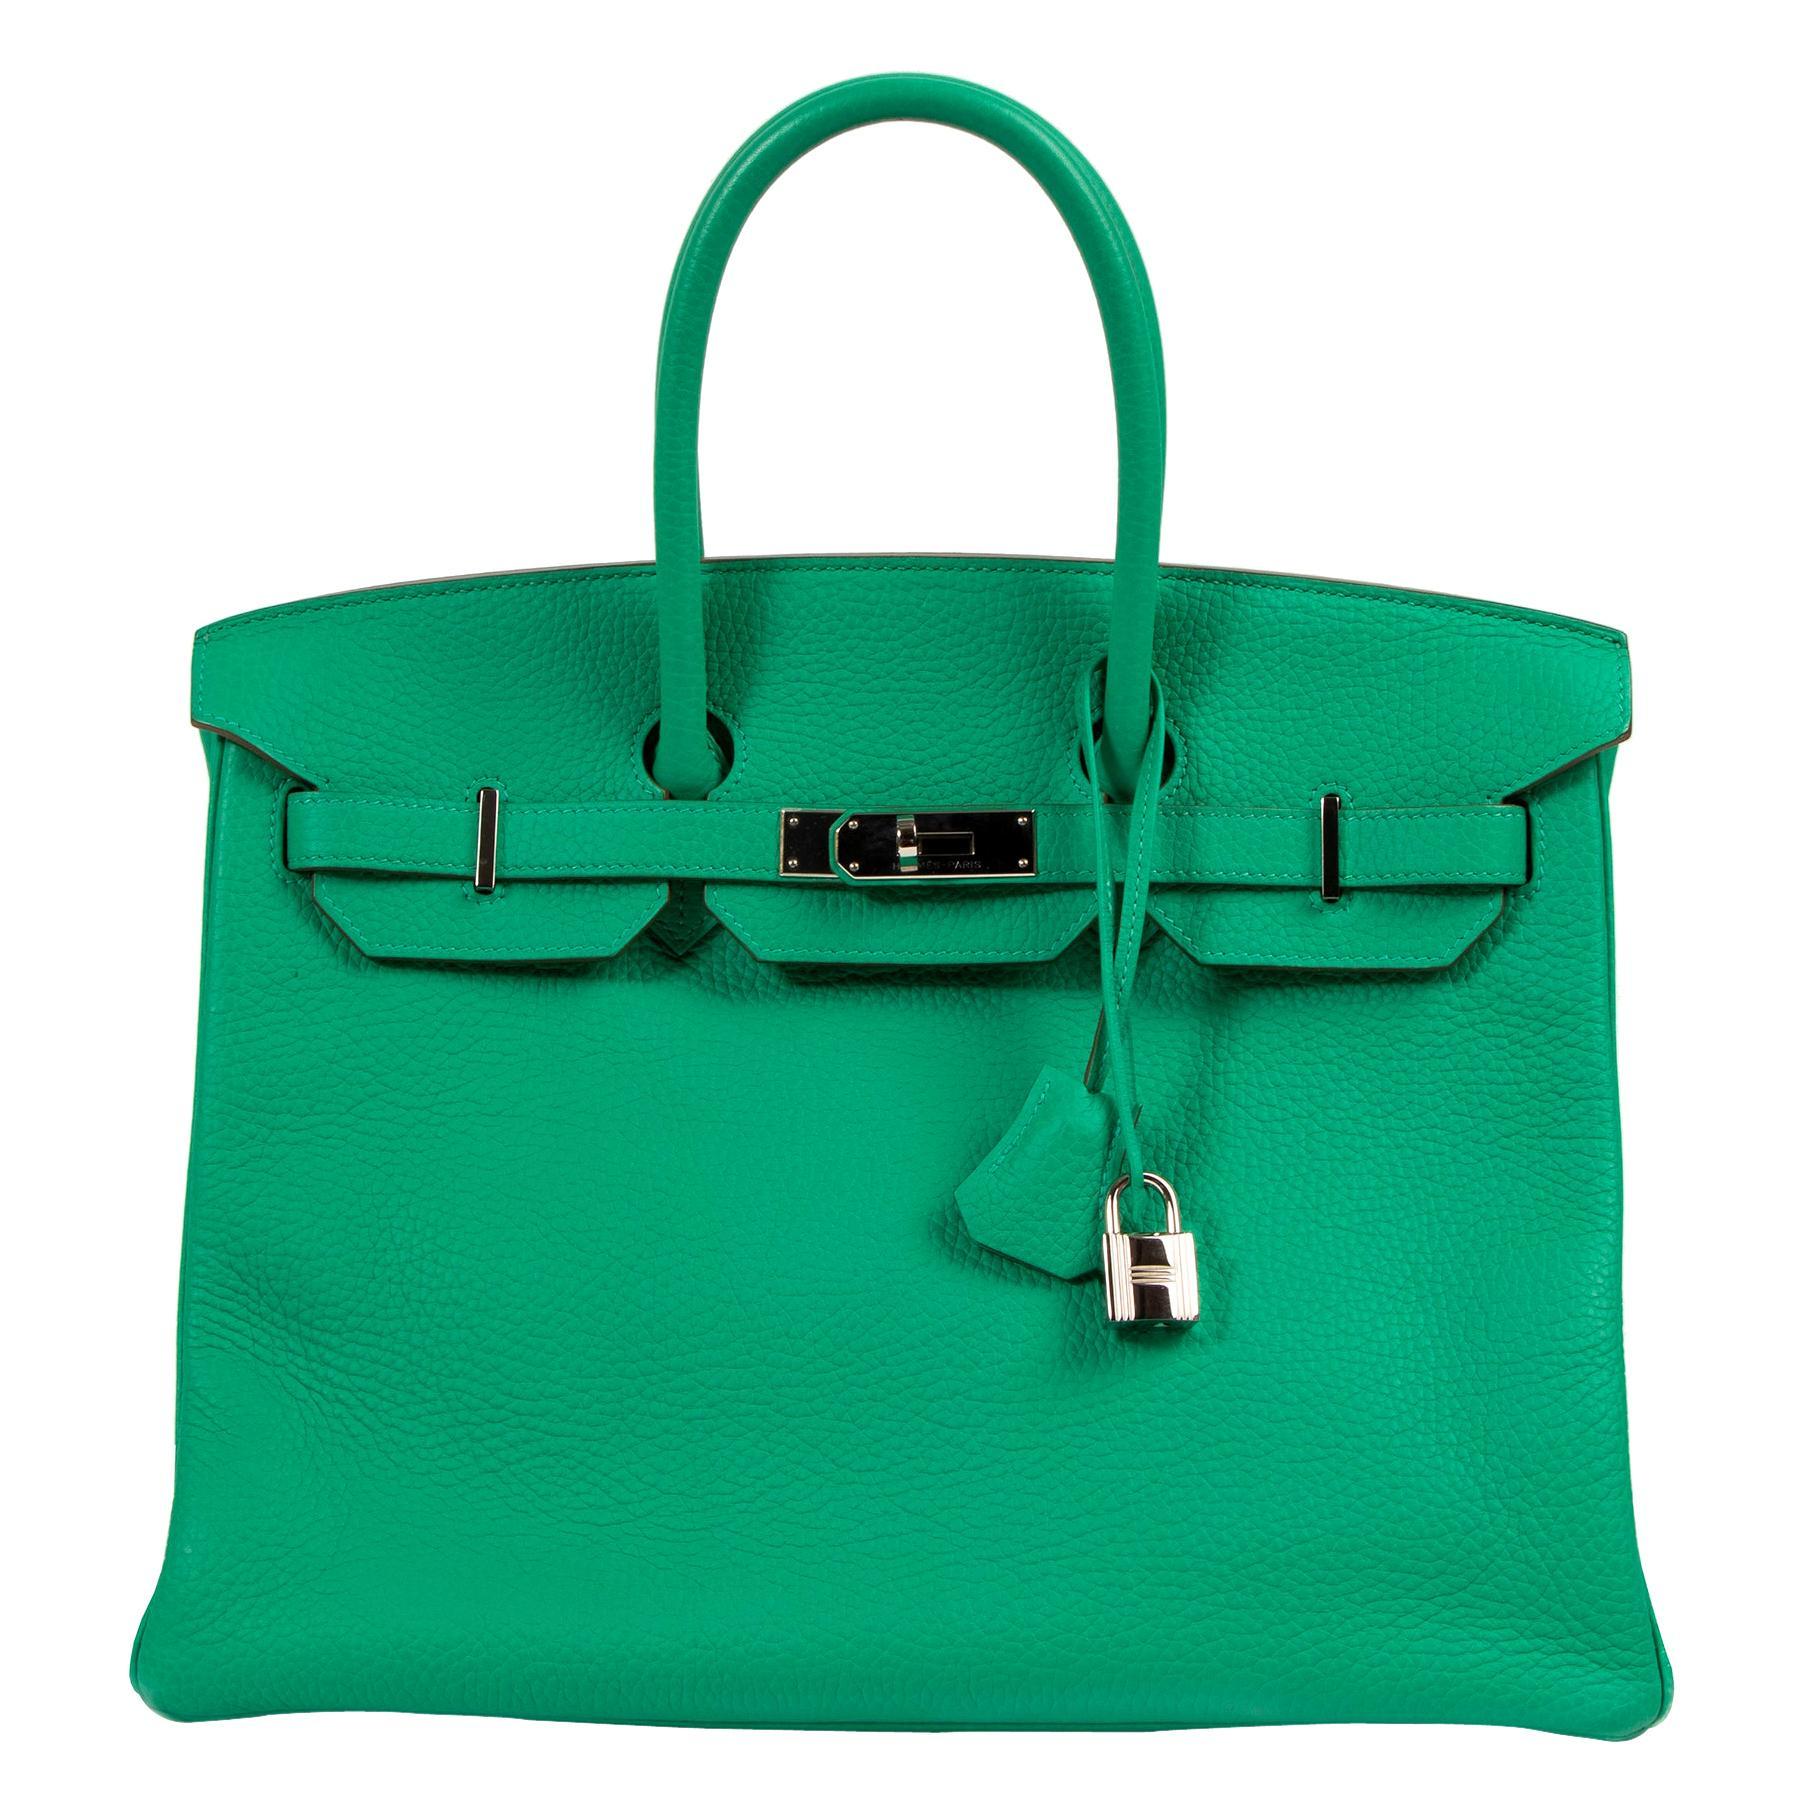 Hermès Birkin 35cm Taurillon Clemence Green Menthe PHW